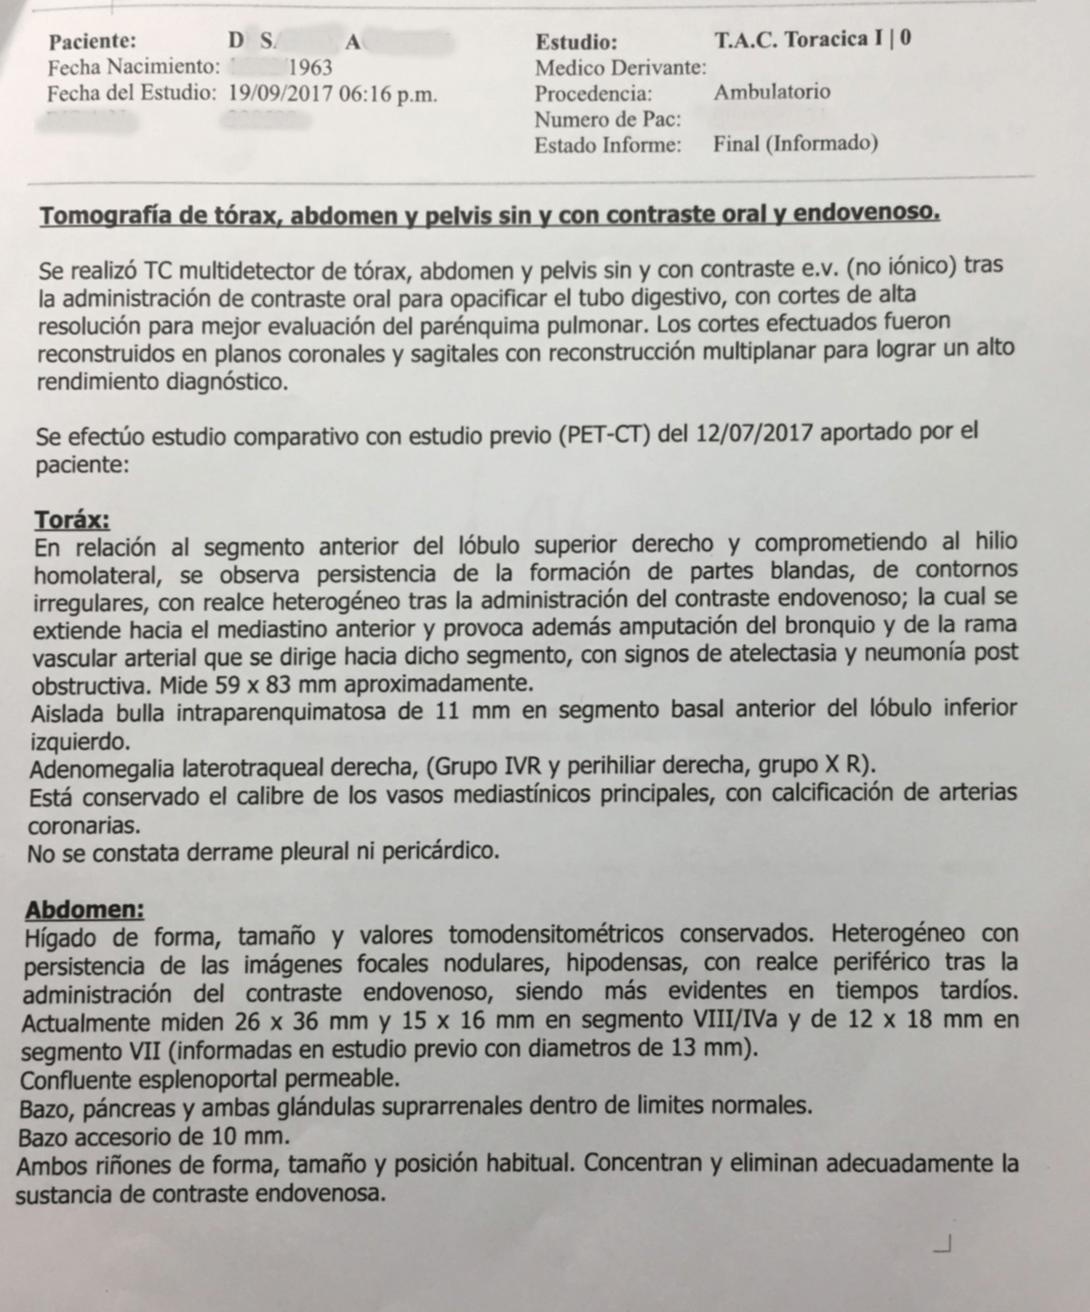 LifEscozul® - A.D.S. 7 - Cáncer de Pulmon